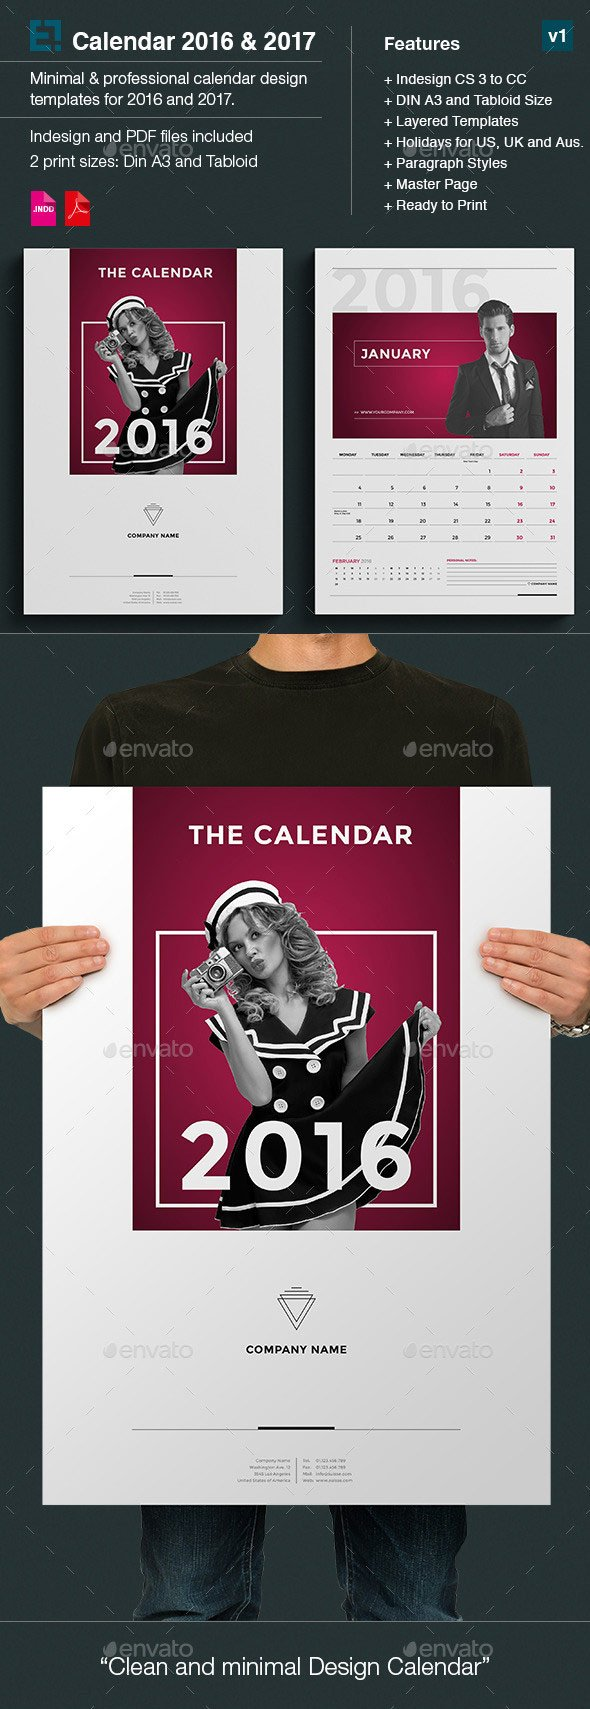 Minimal photo calendar template monthly 2016